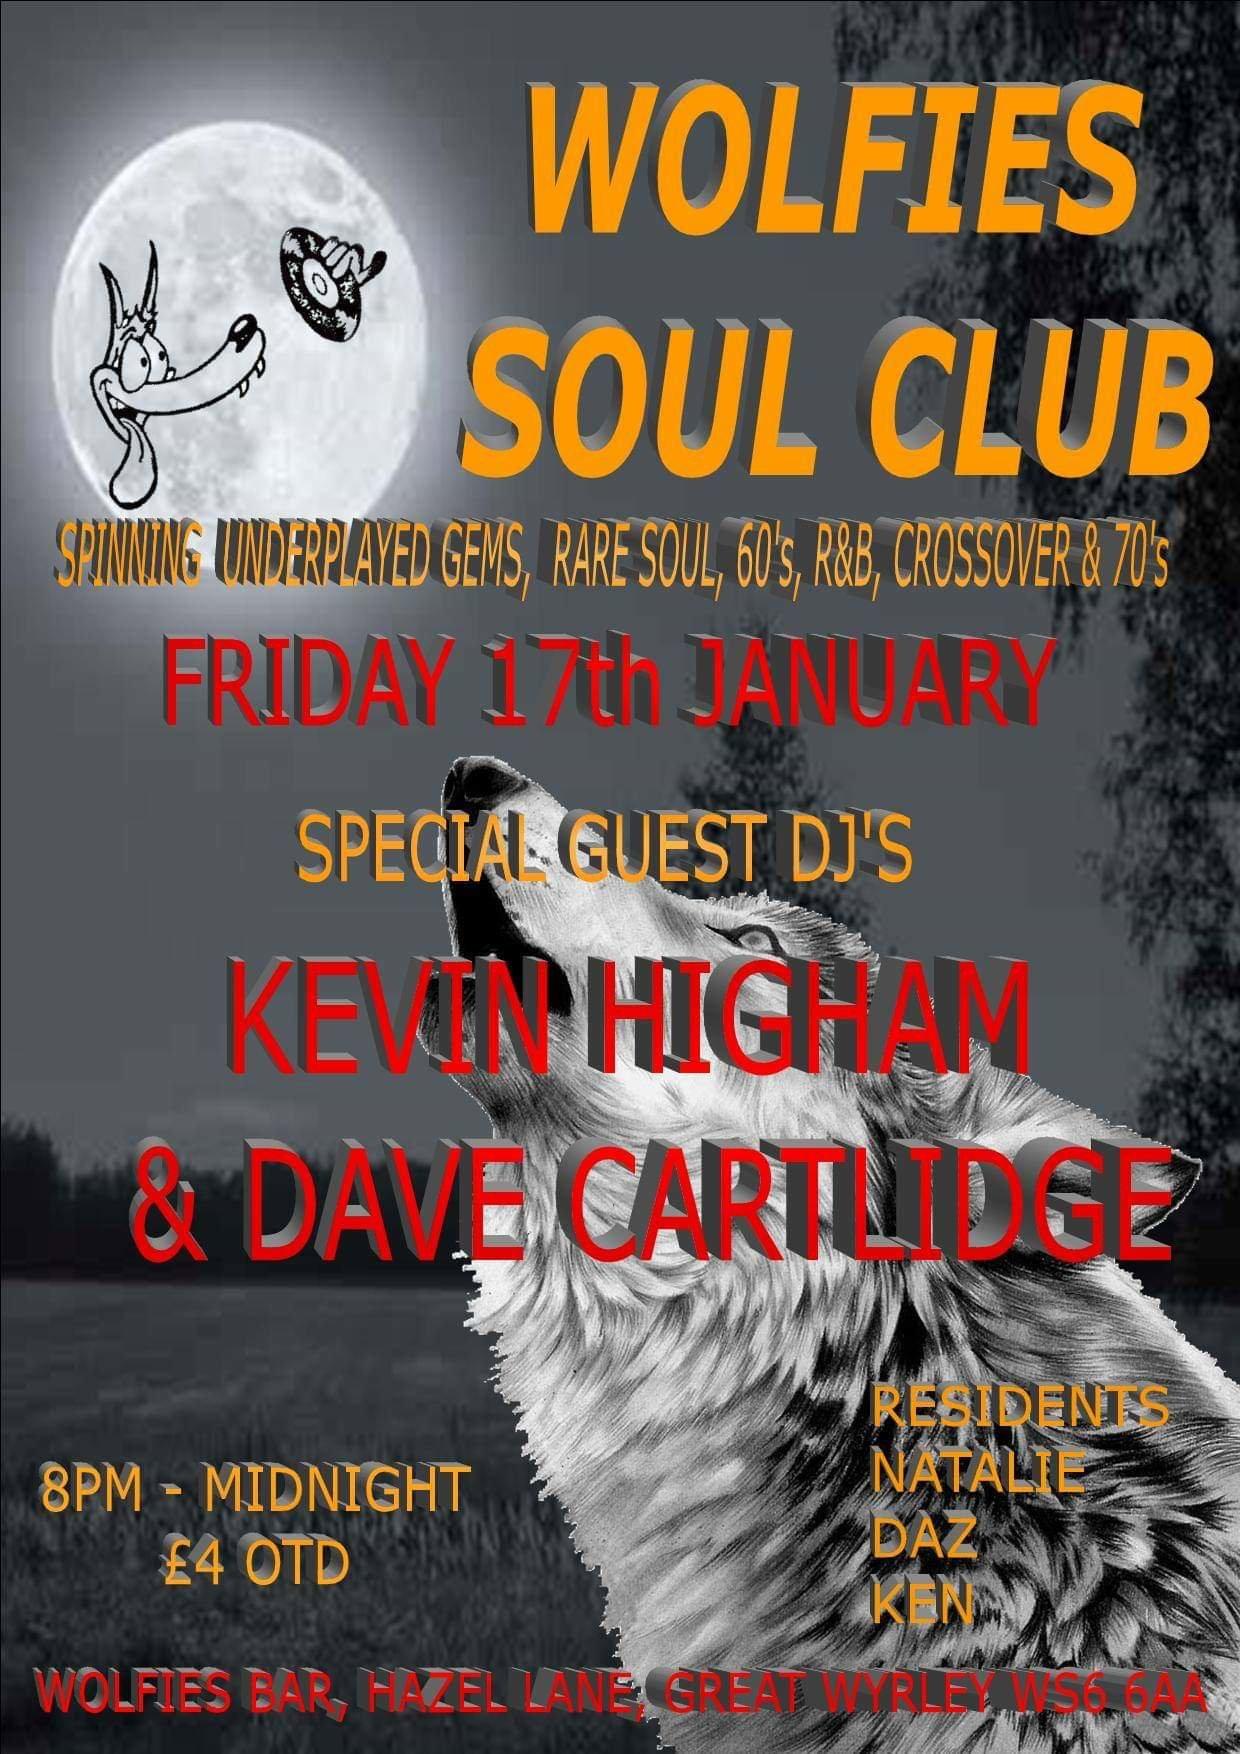 Wolfies Soul Club  Kev Higham  Dave Cartlidge flyer